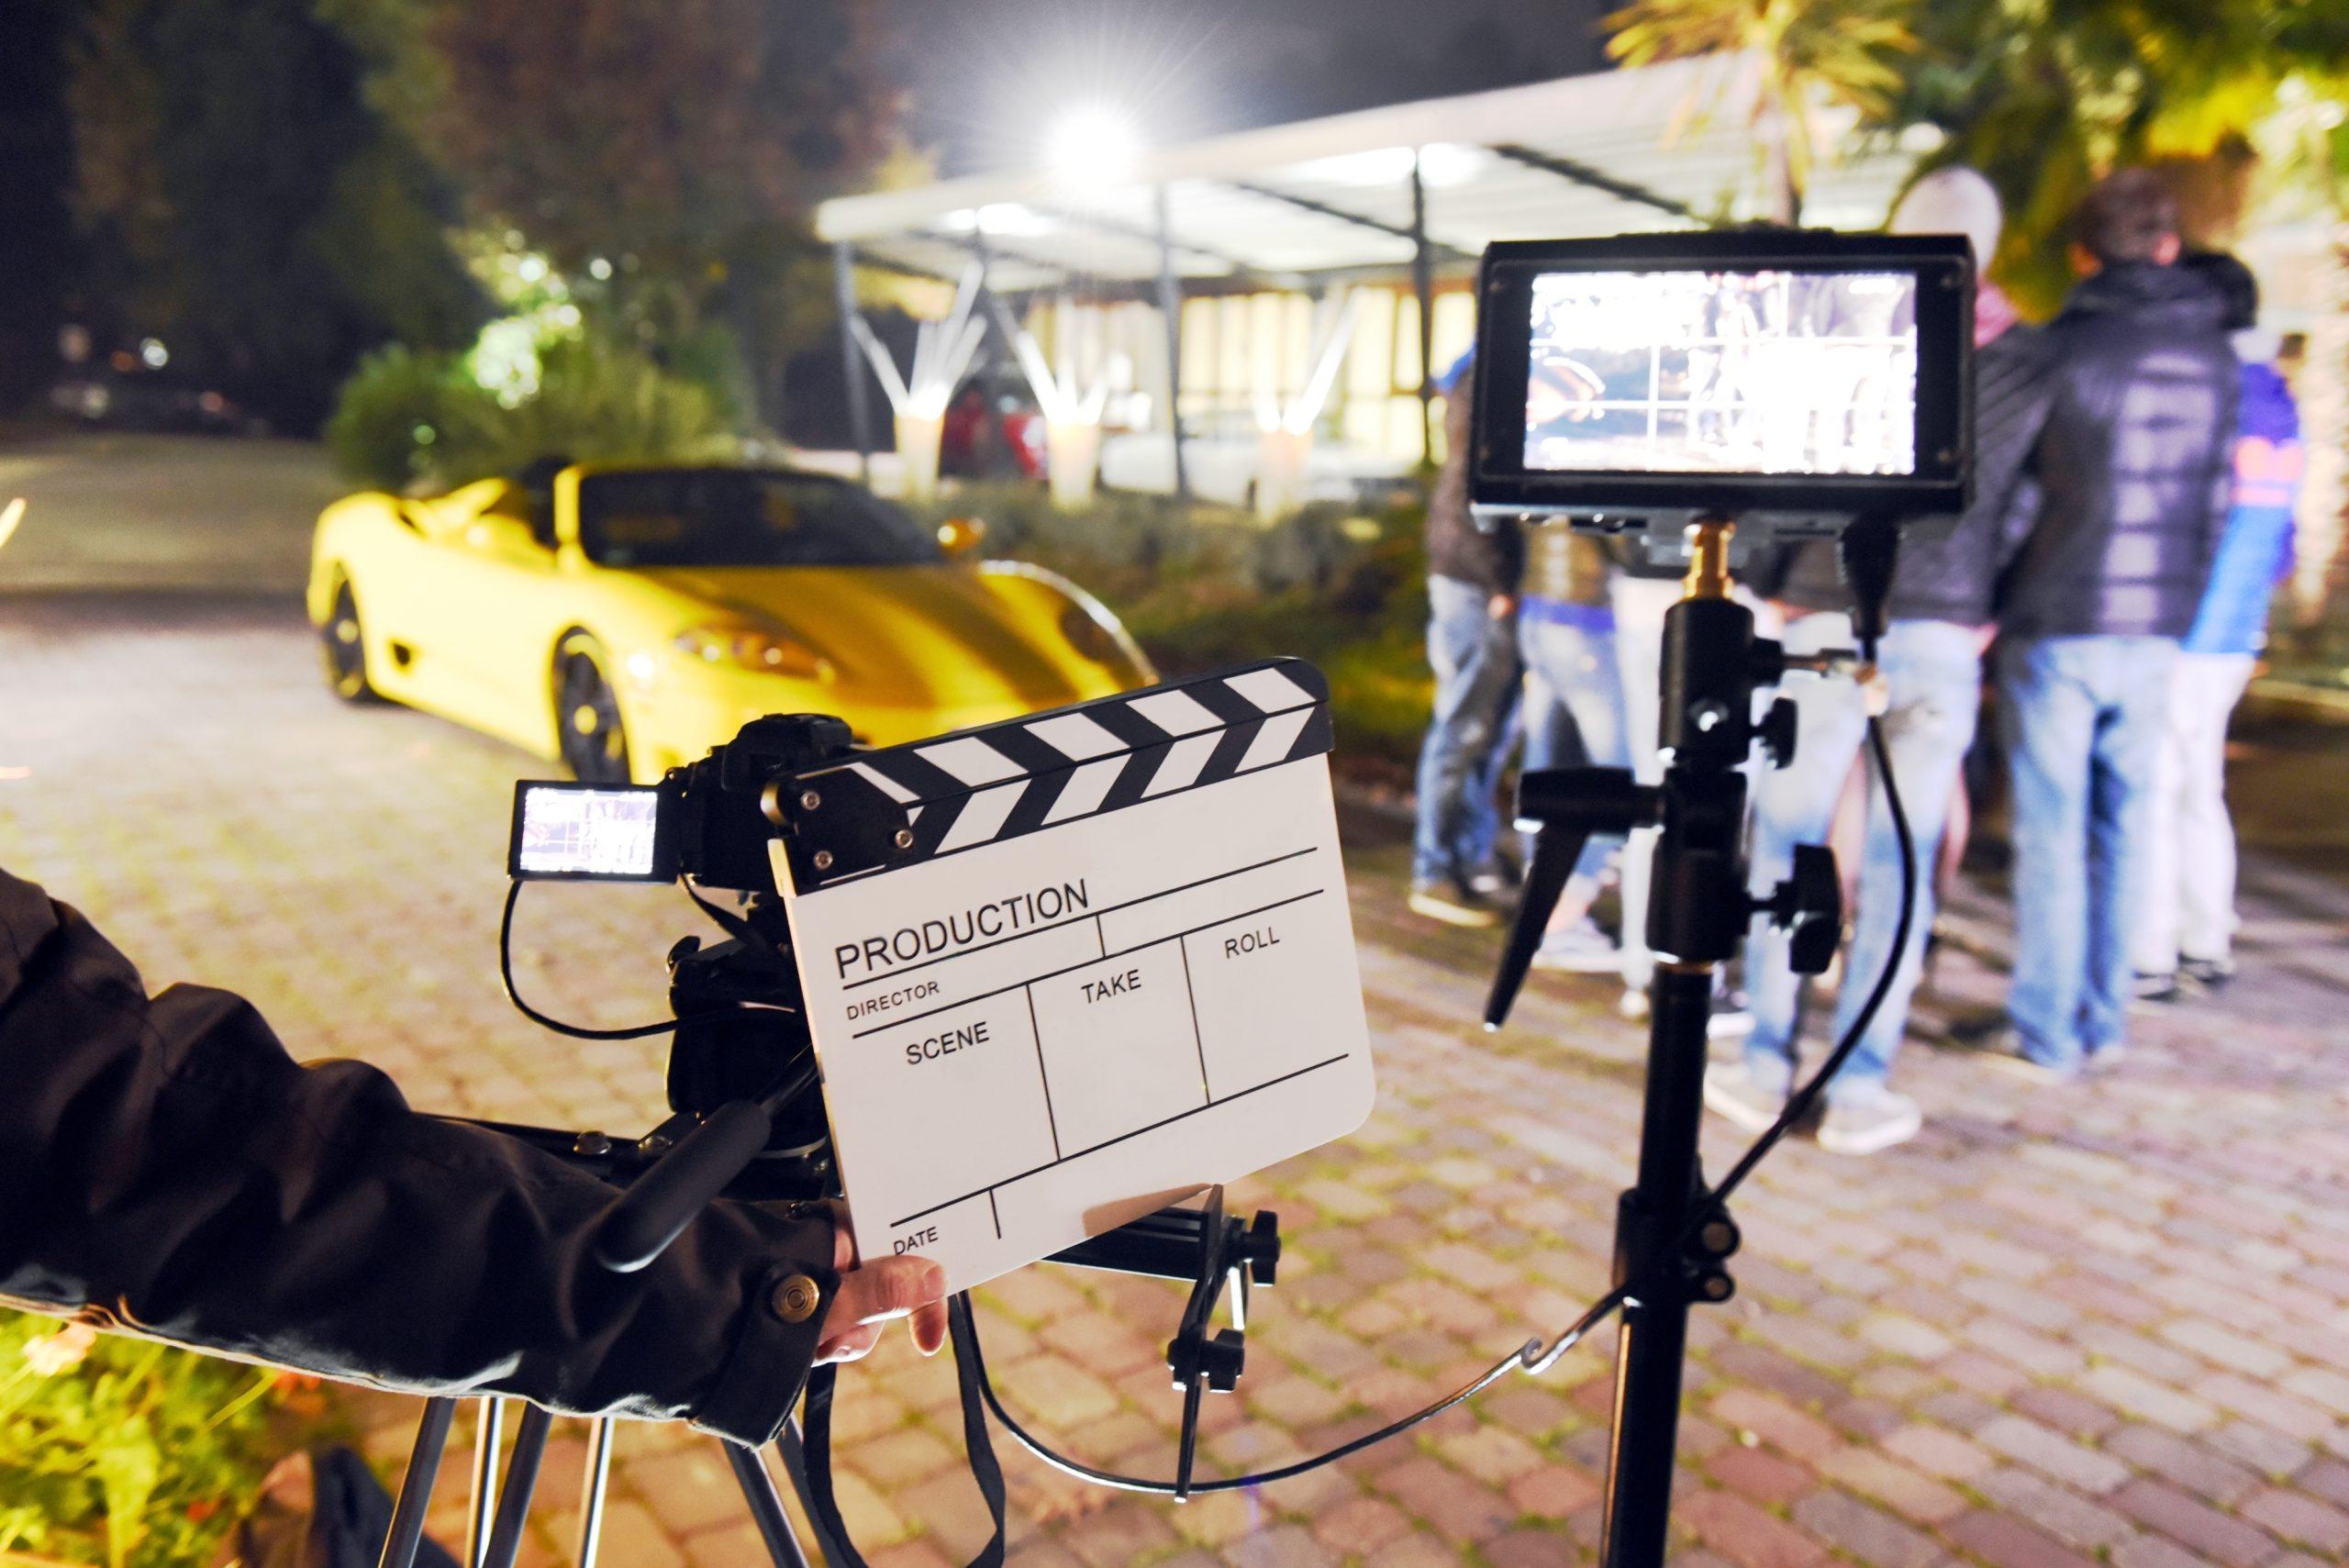 Denton Black Film Festival's Partnership with Panavision Offers Exposure for Black Filmmakers